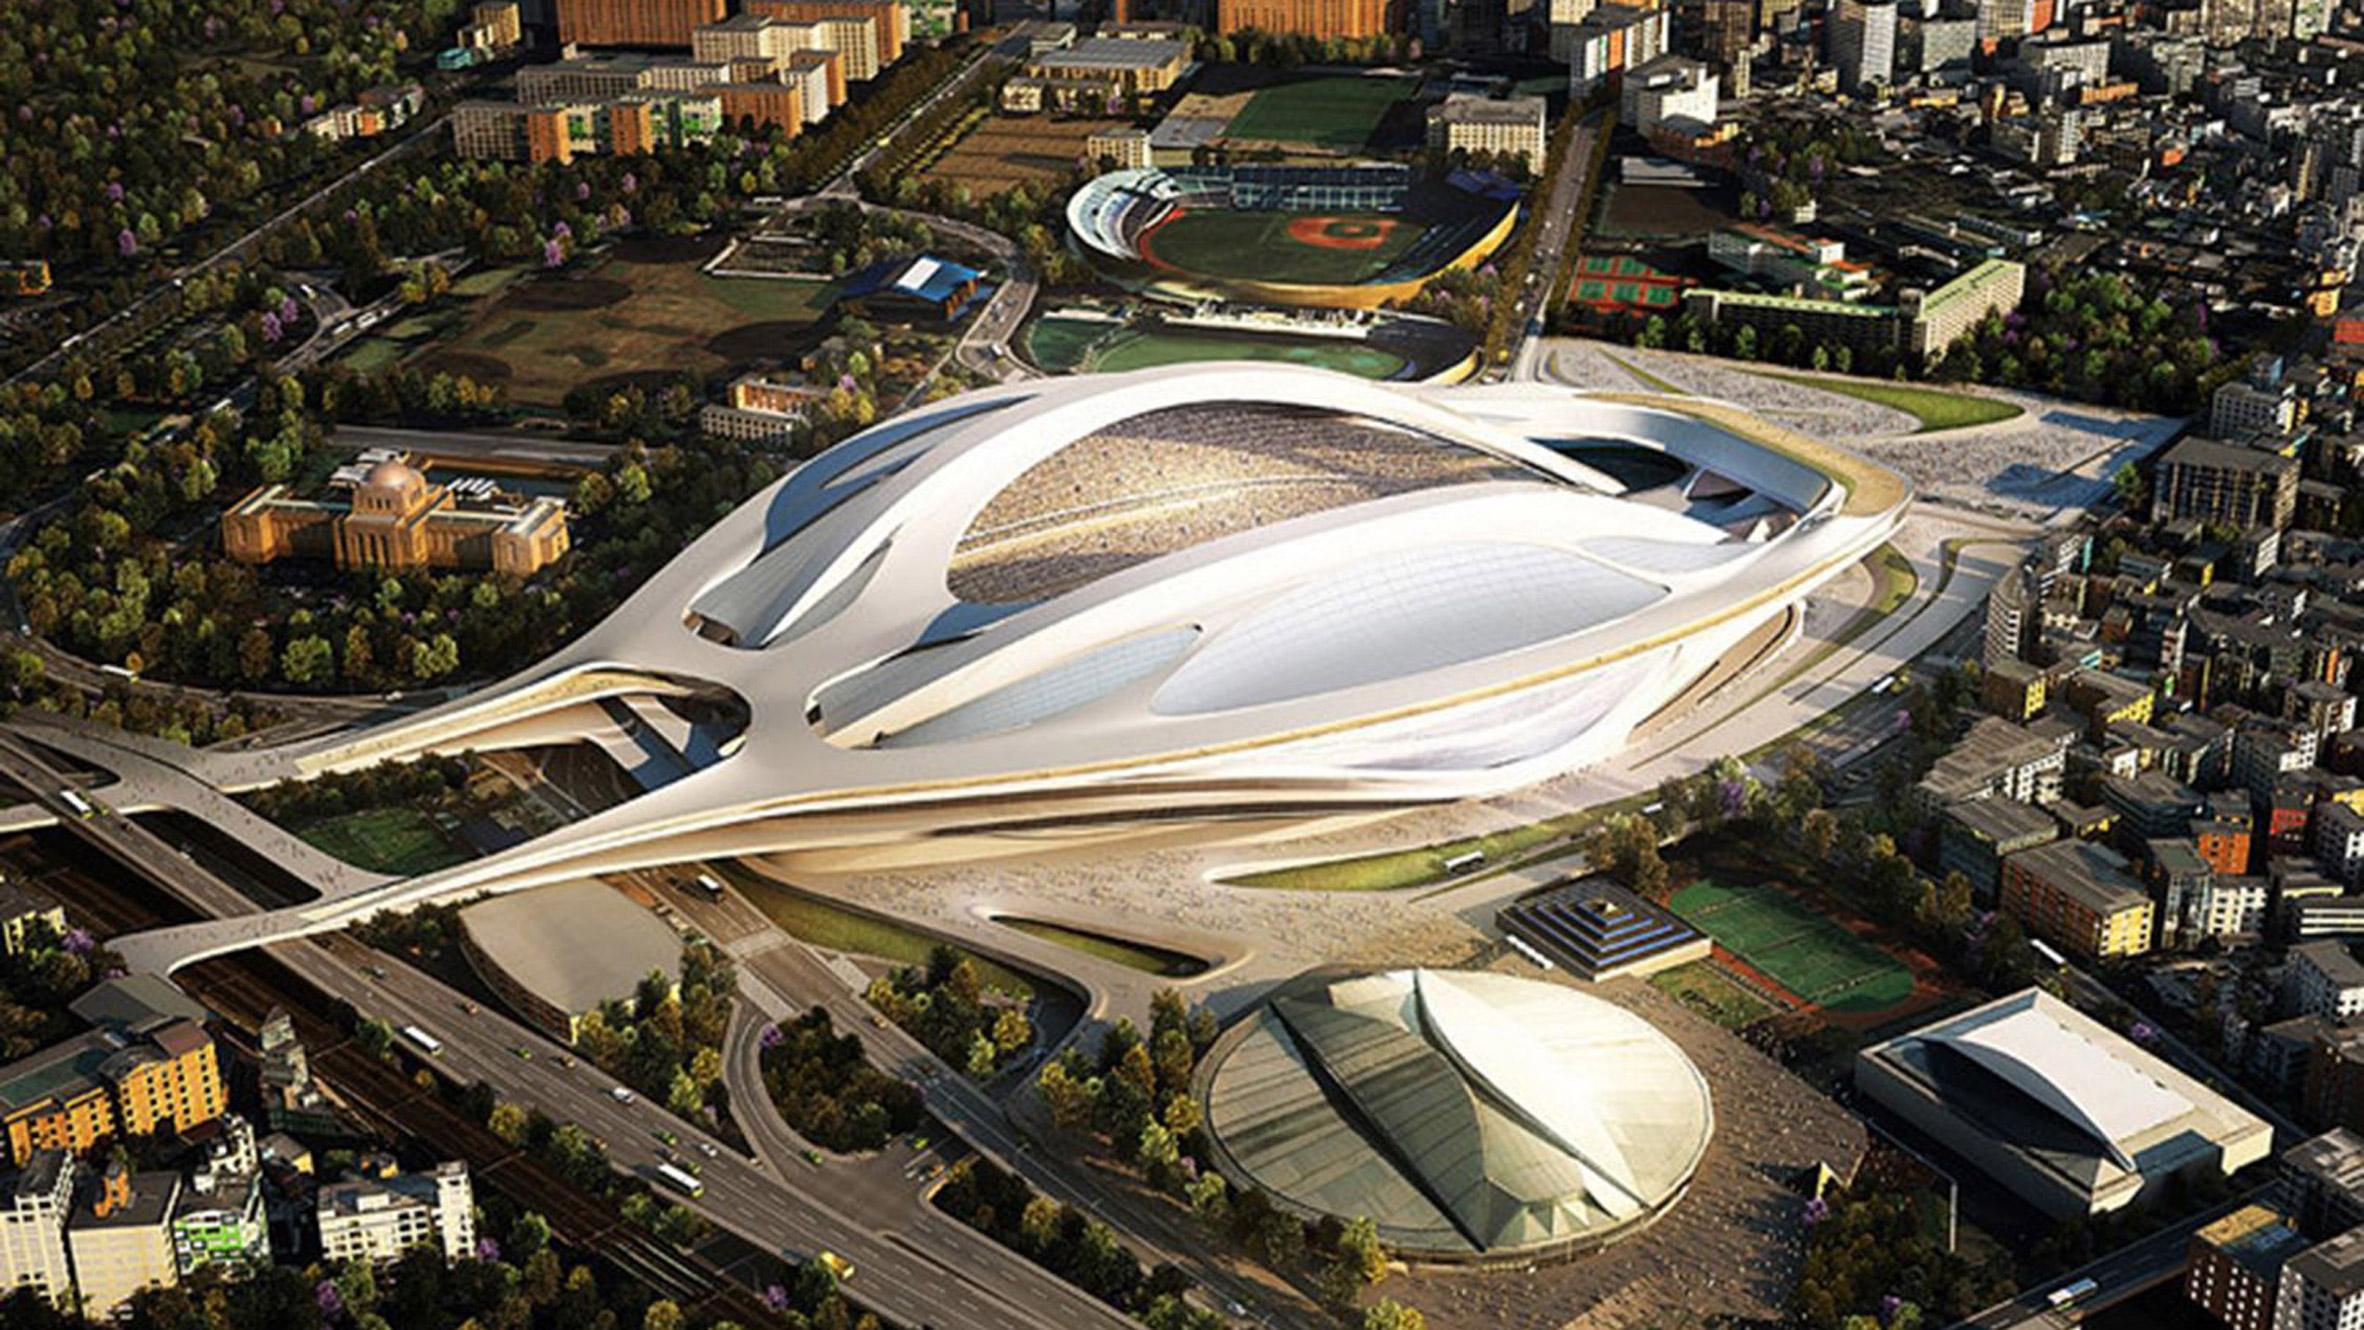 Zaha Hadid's Tokyo Olympic stadium design